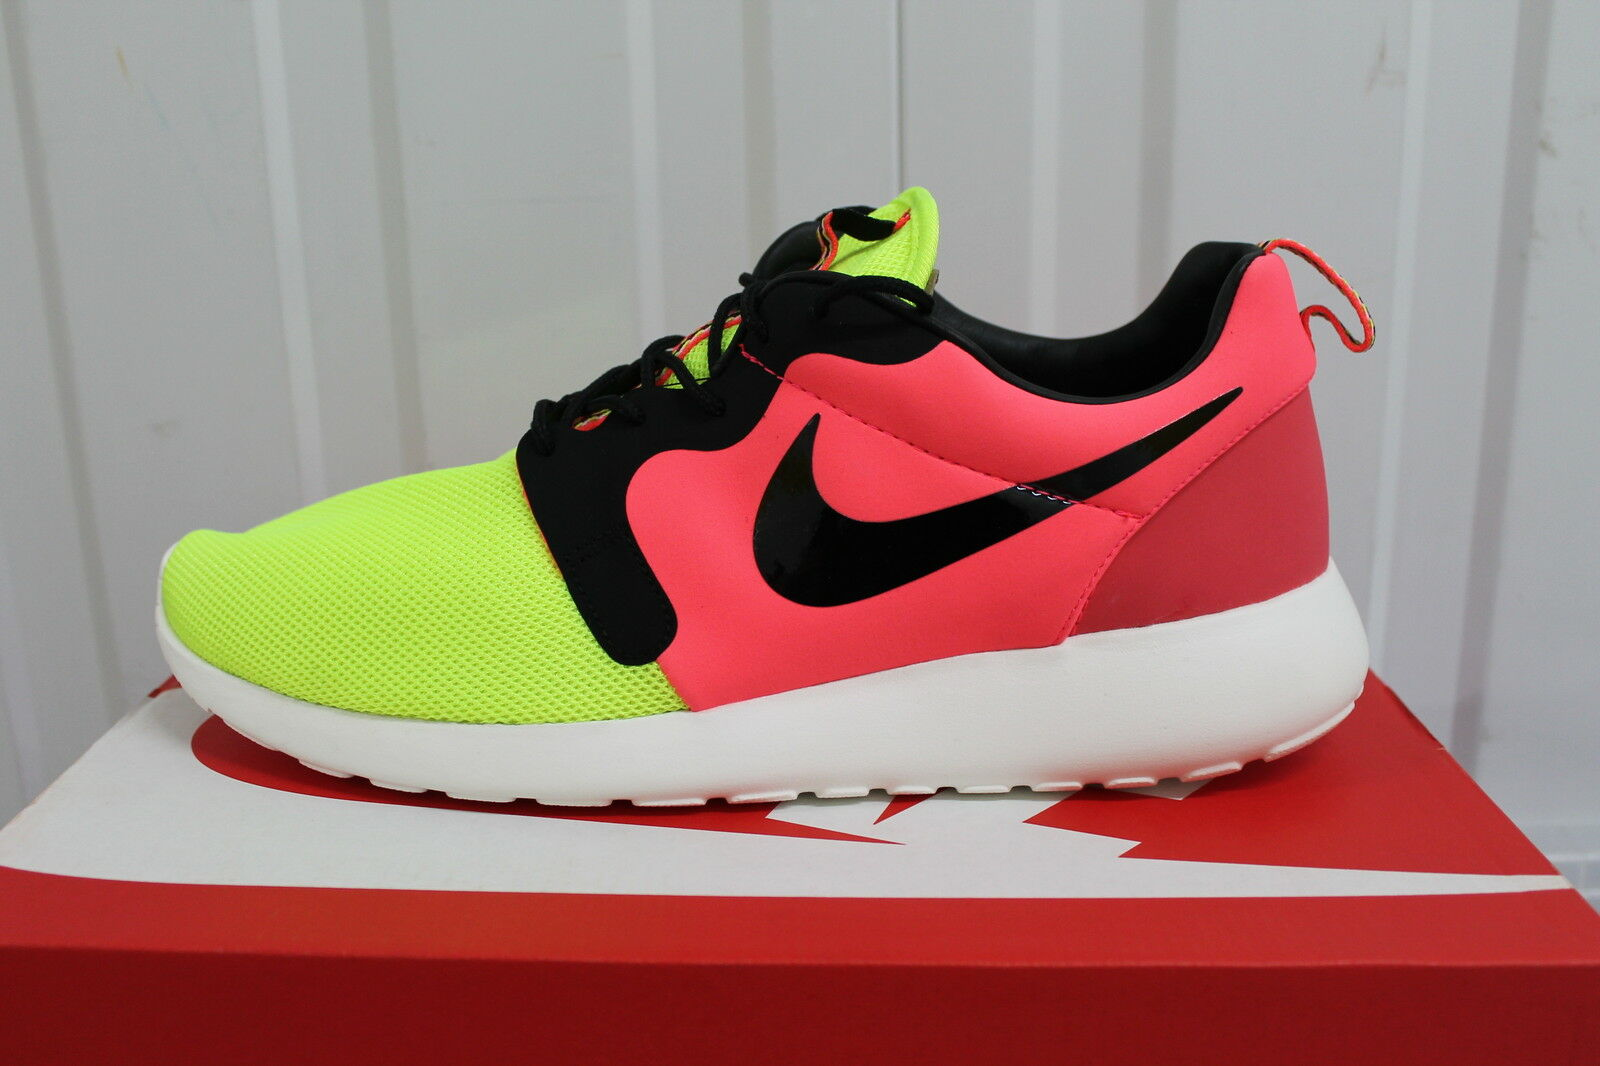 hot sale online d8cc7 0ea5d Nike rosherun Hyper Premium Premium Premium hombres, s la reducción del  precio 669689-700